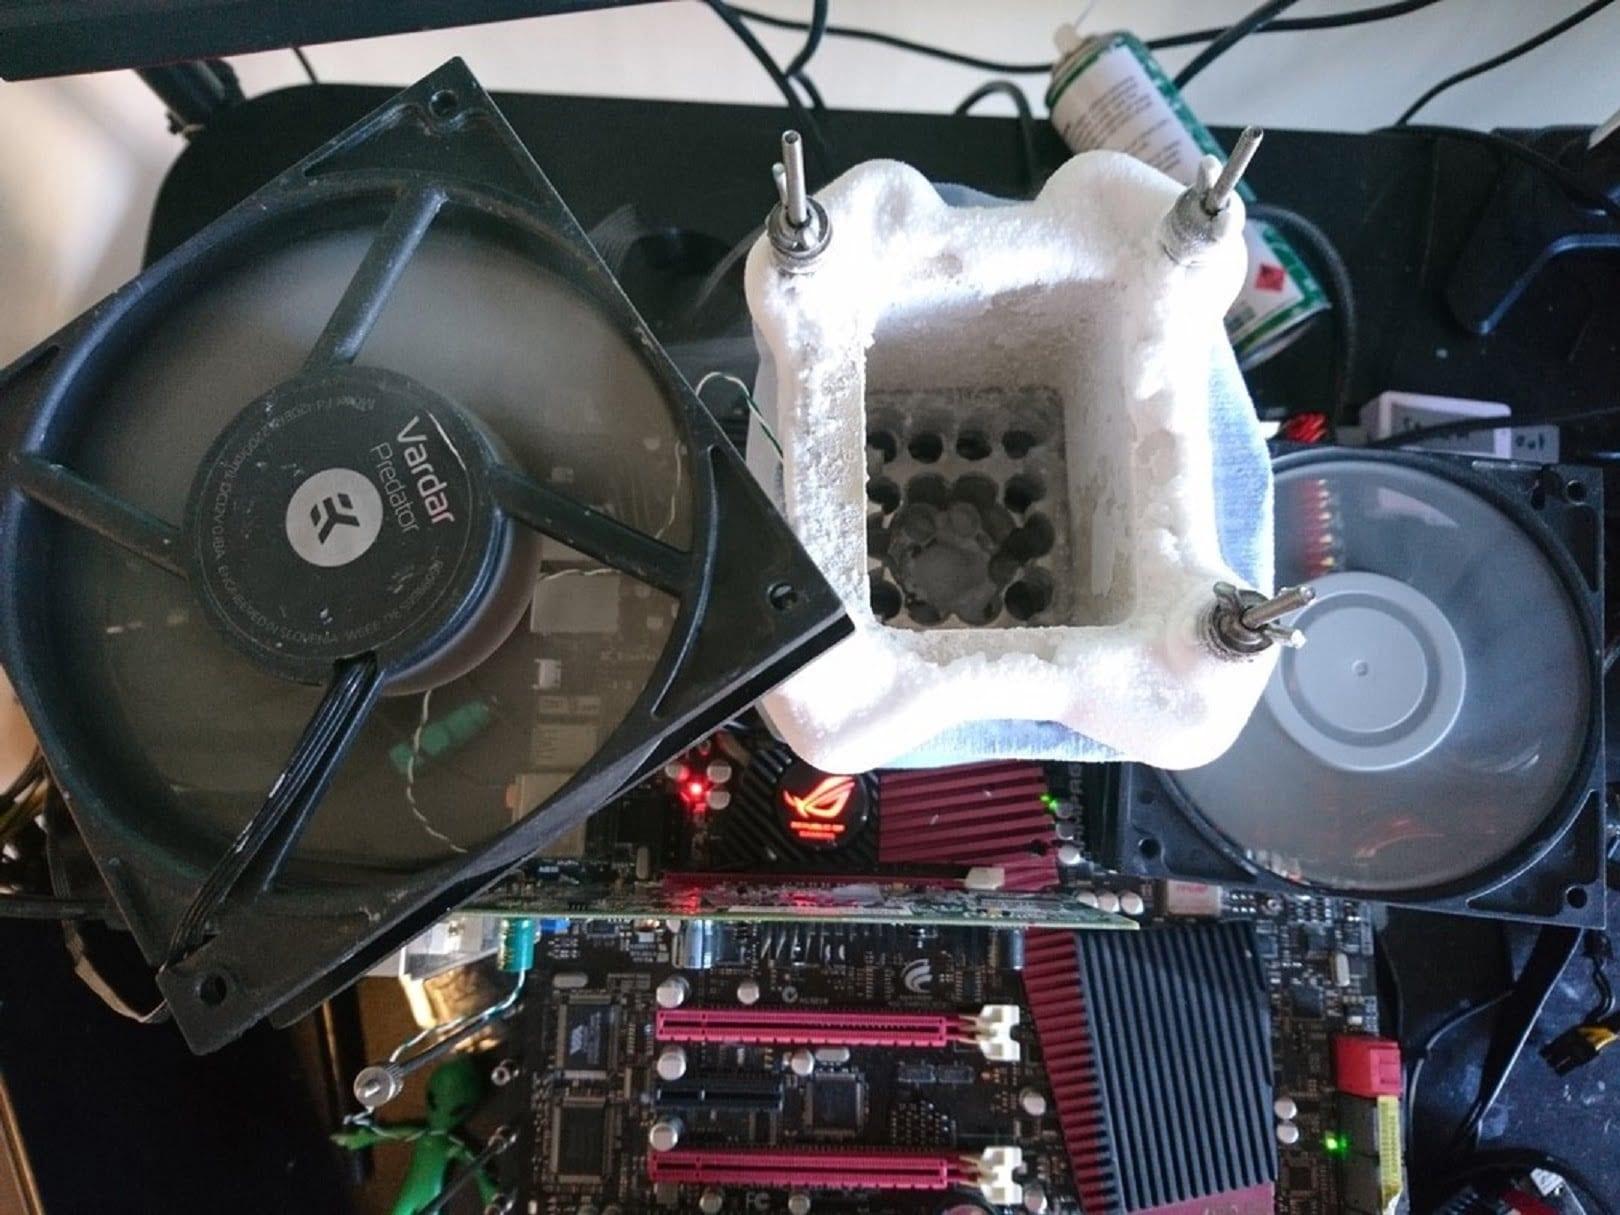 unityofsaints установил два рекорда в модельном зачете чипа Intel Core i7-930